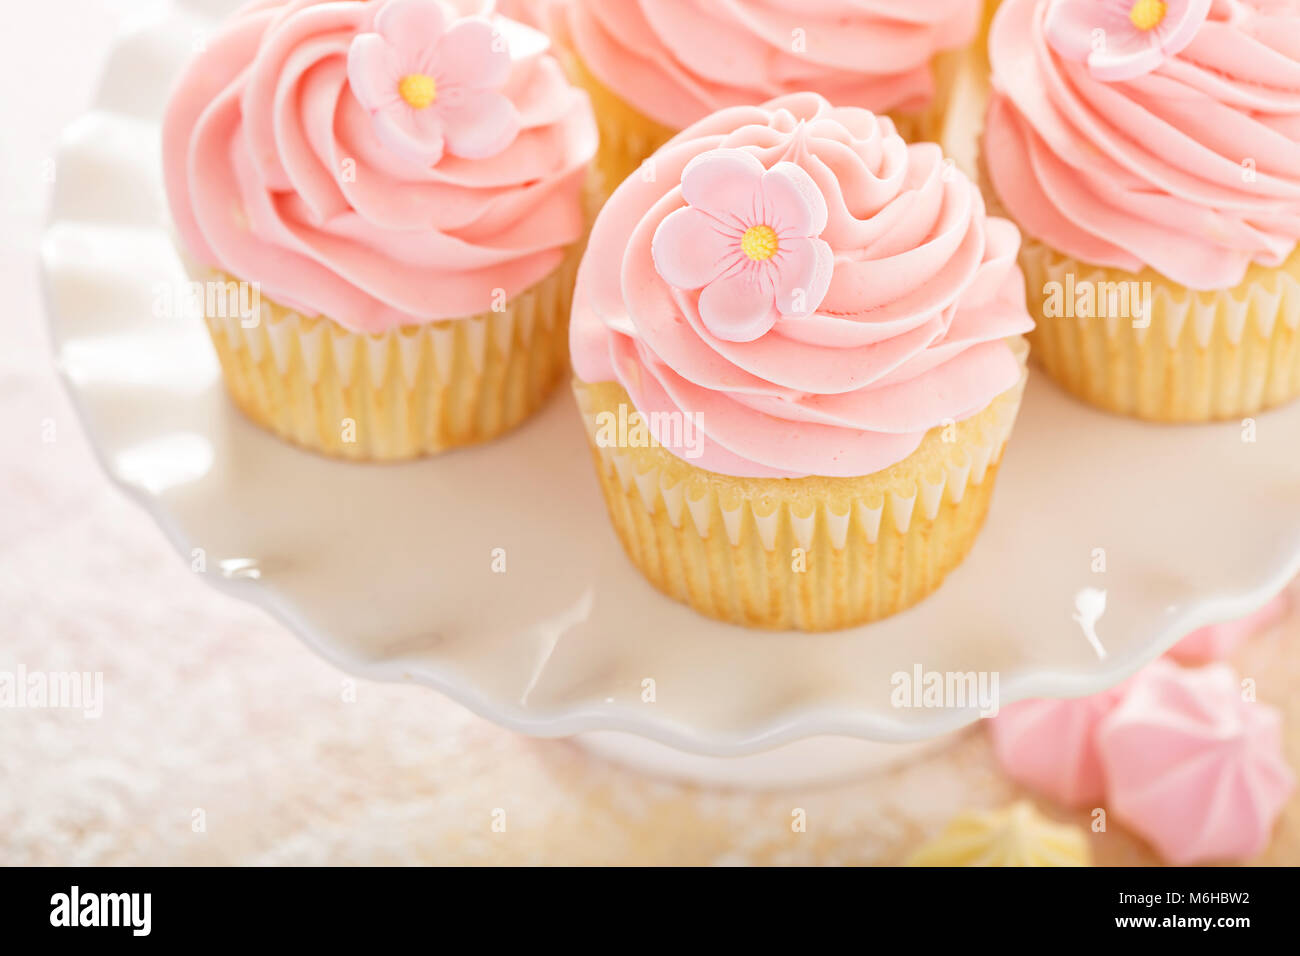 Vanilla strawberry cupcakes with sugar flower - Stock Image